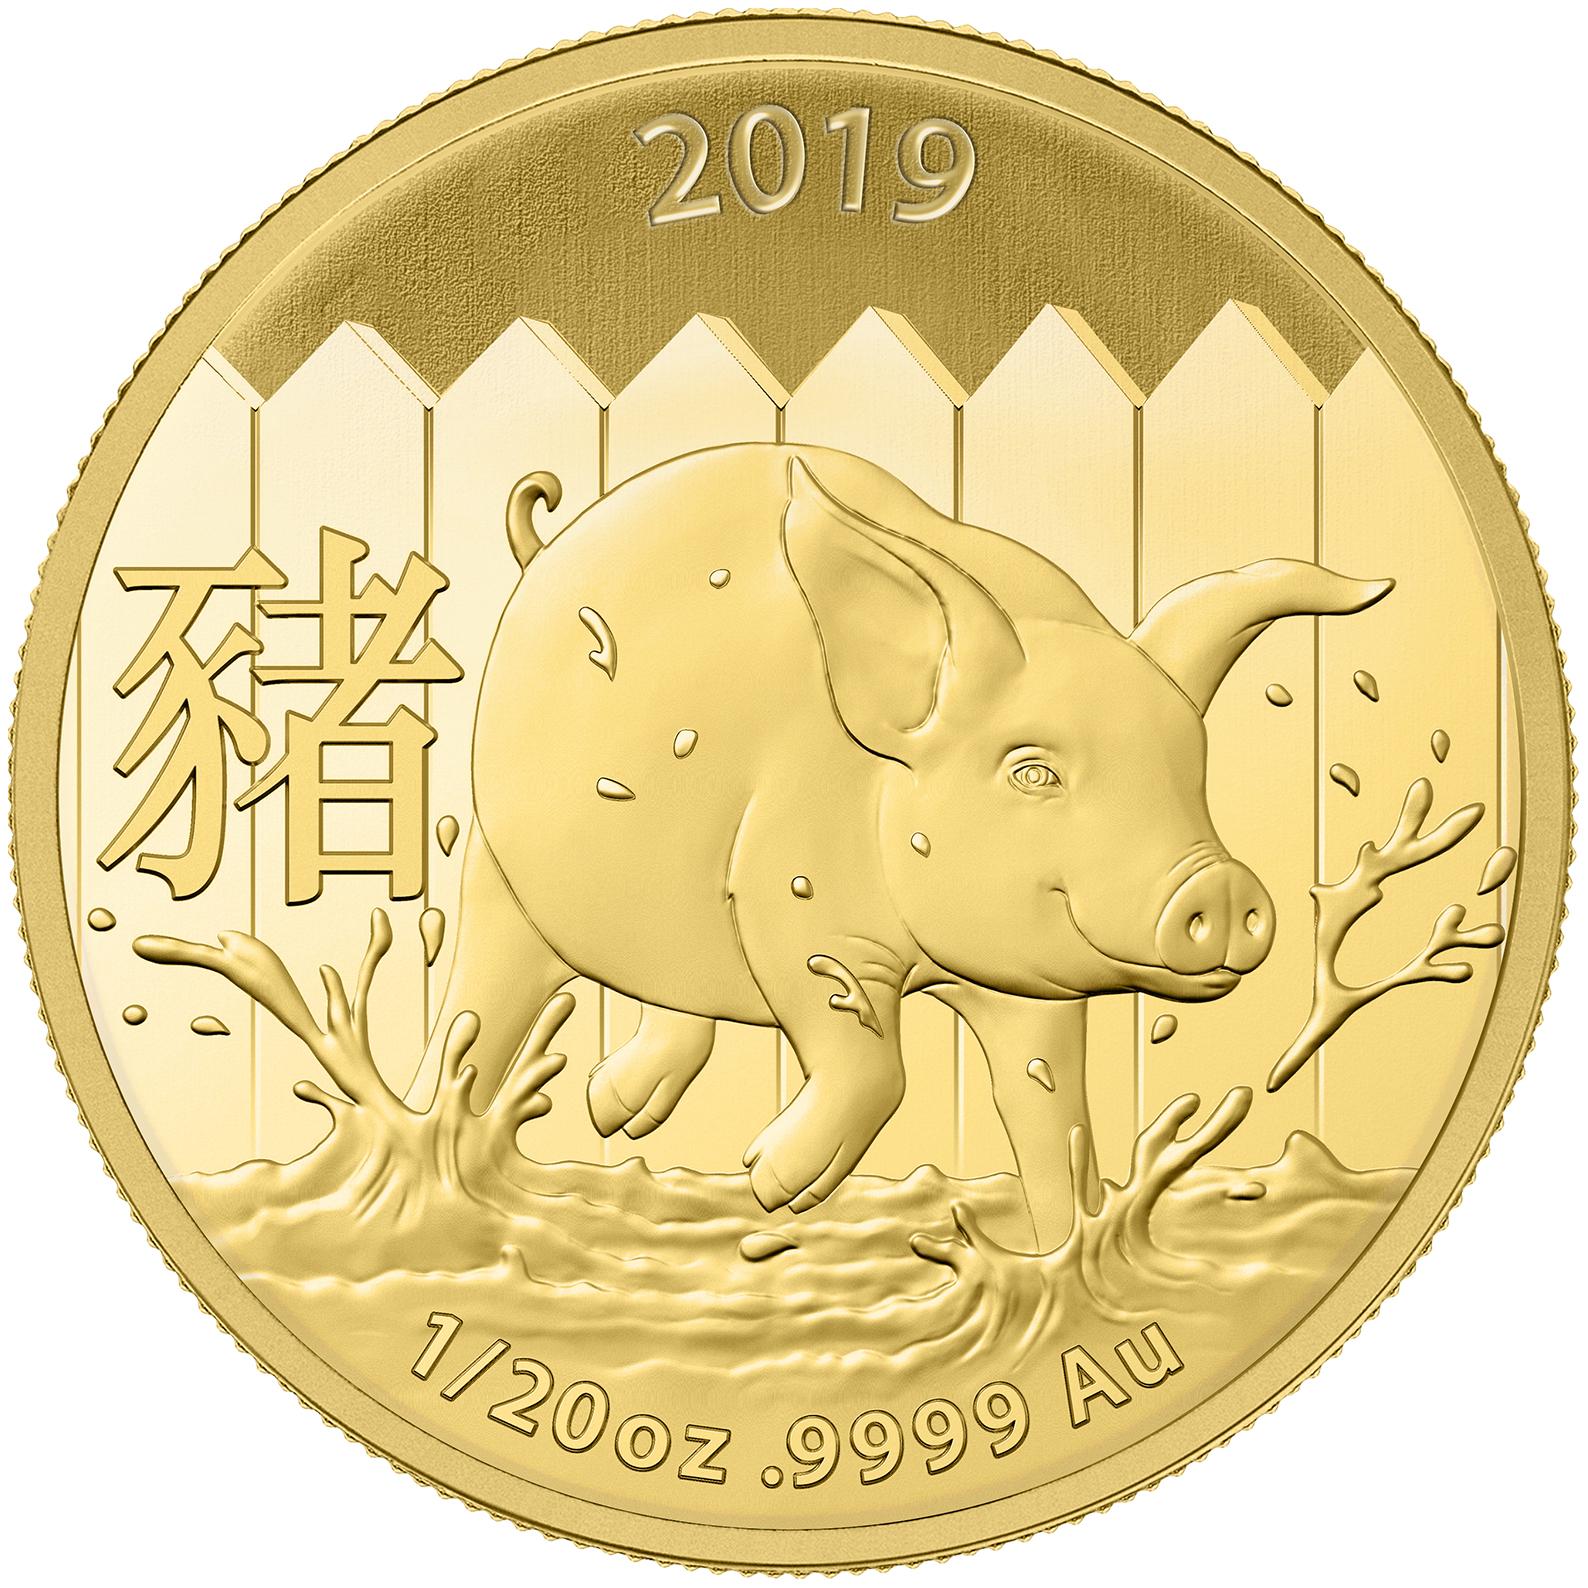 1/20 oz Gold Coin - Lunar Pig BU 2019